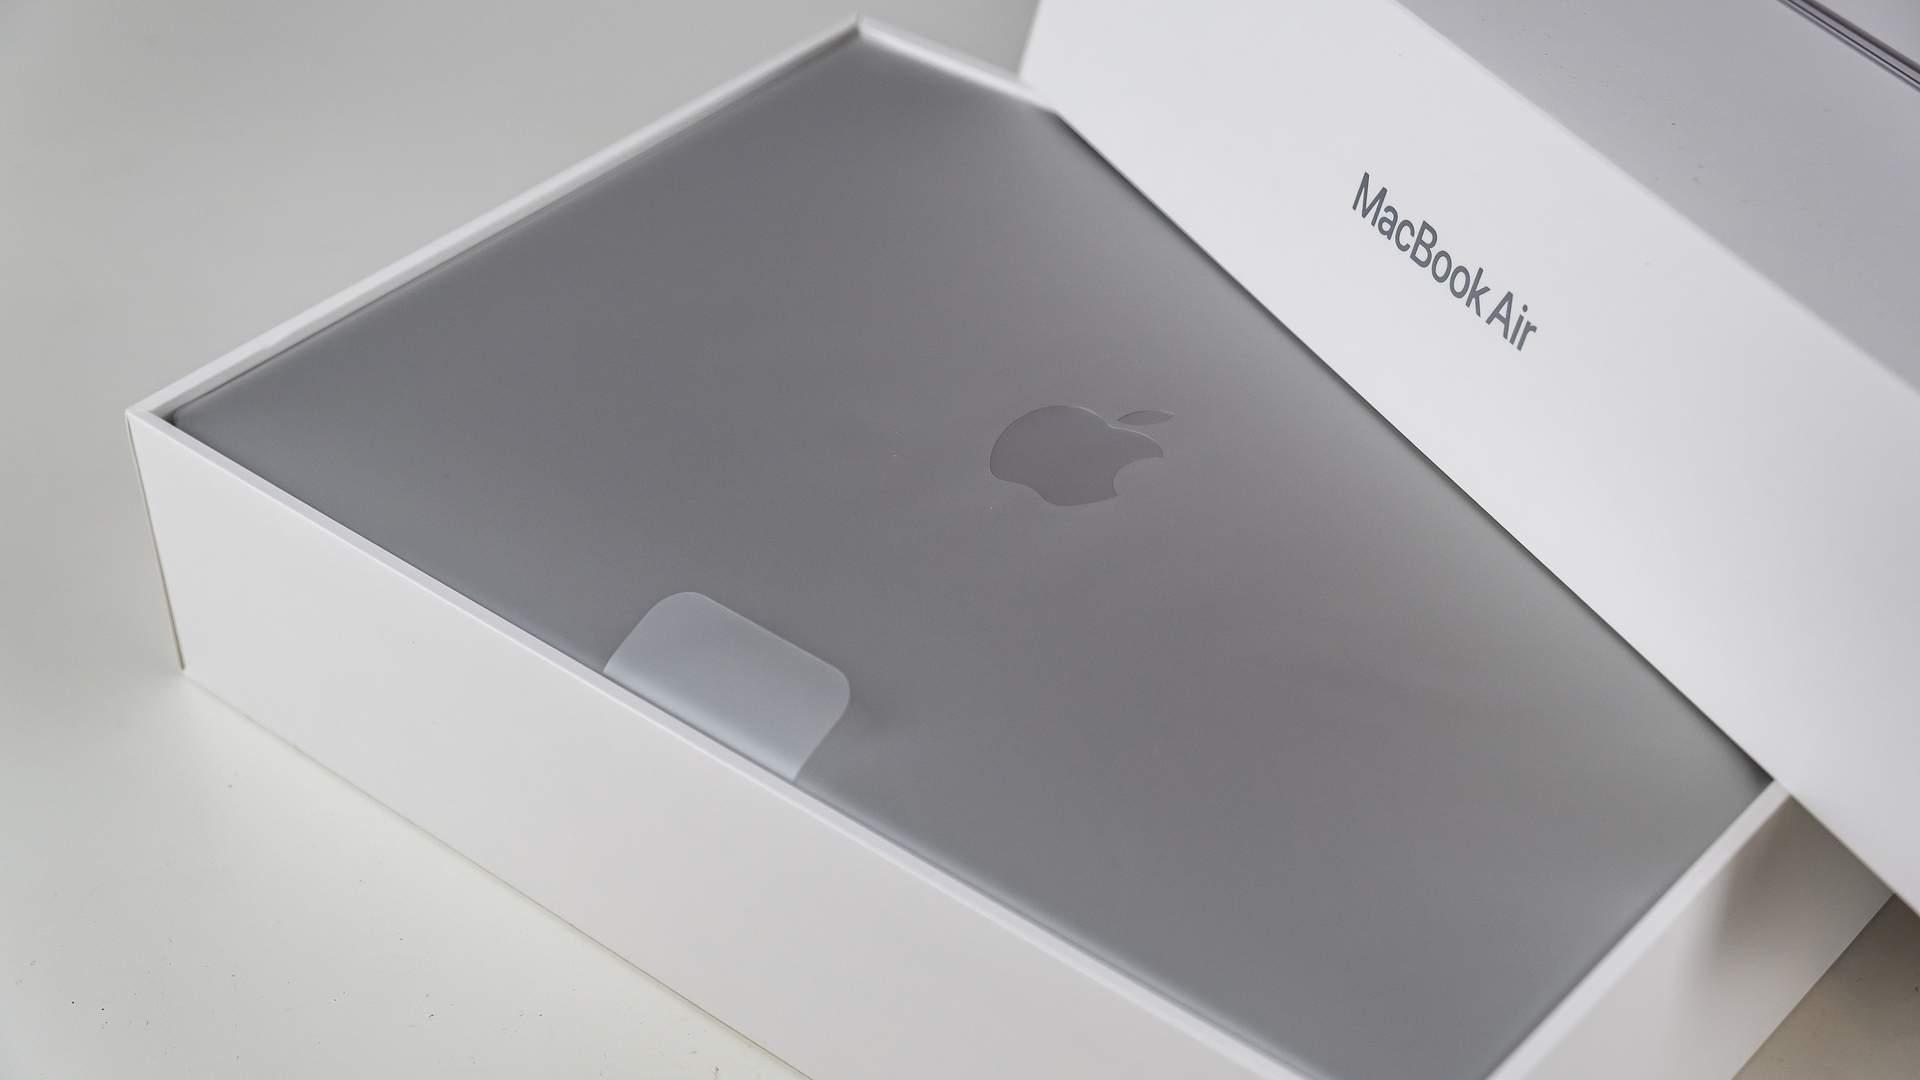 Caixa branca do MacBook Air aberta, mostrando o notebook da Apple na cor prateada